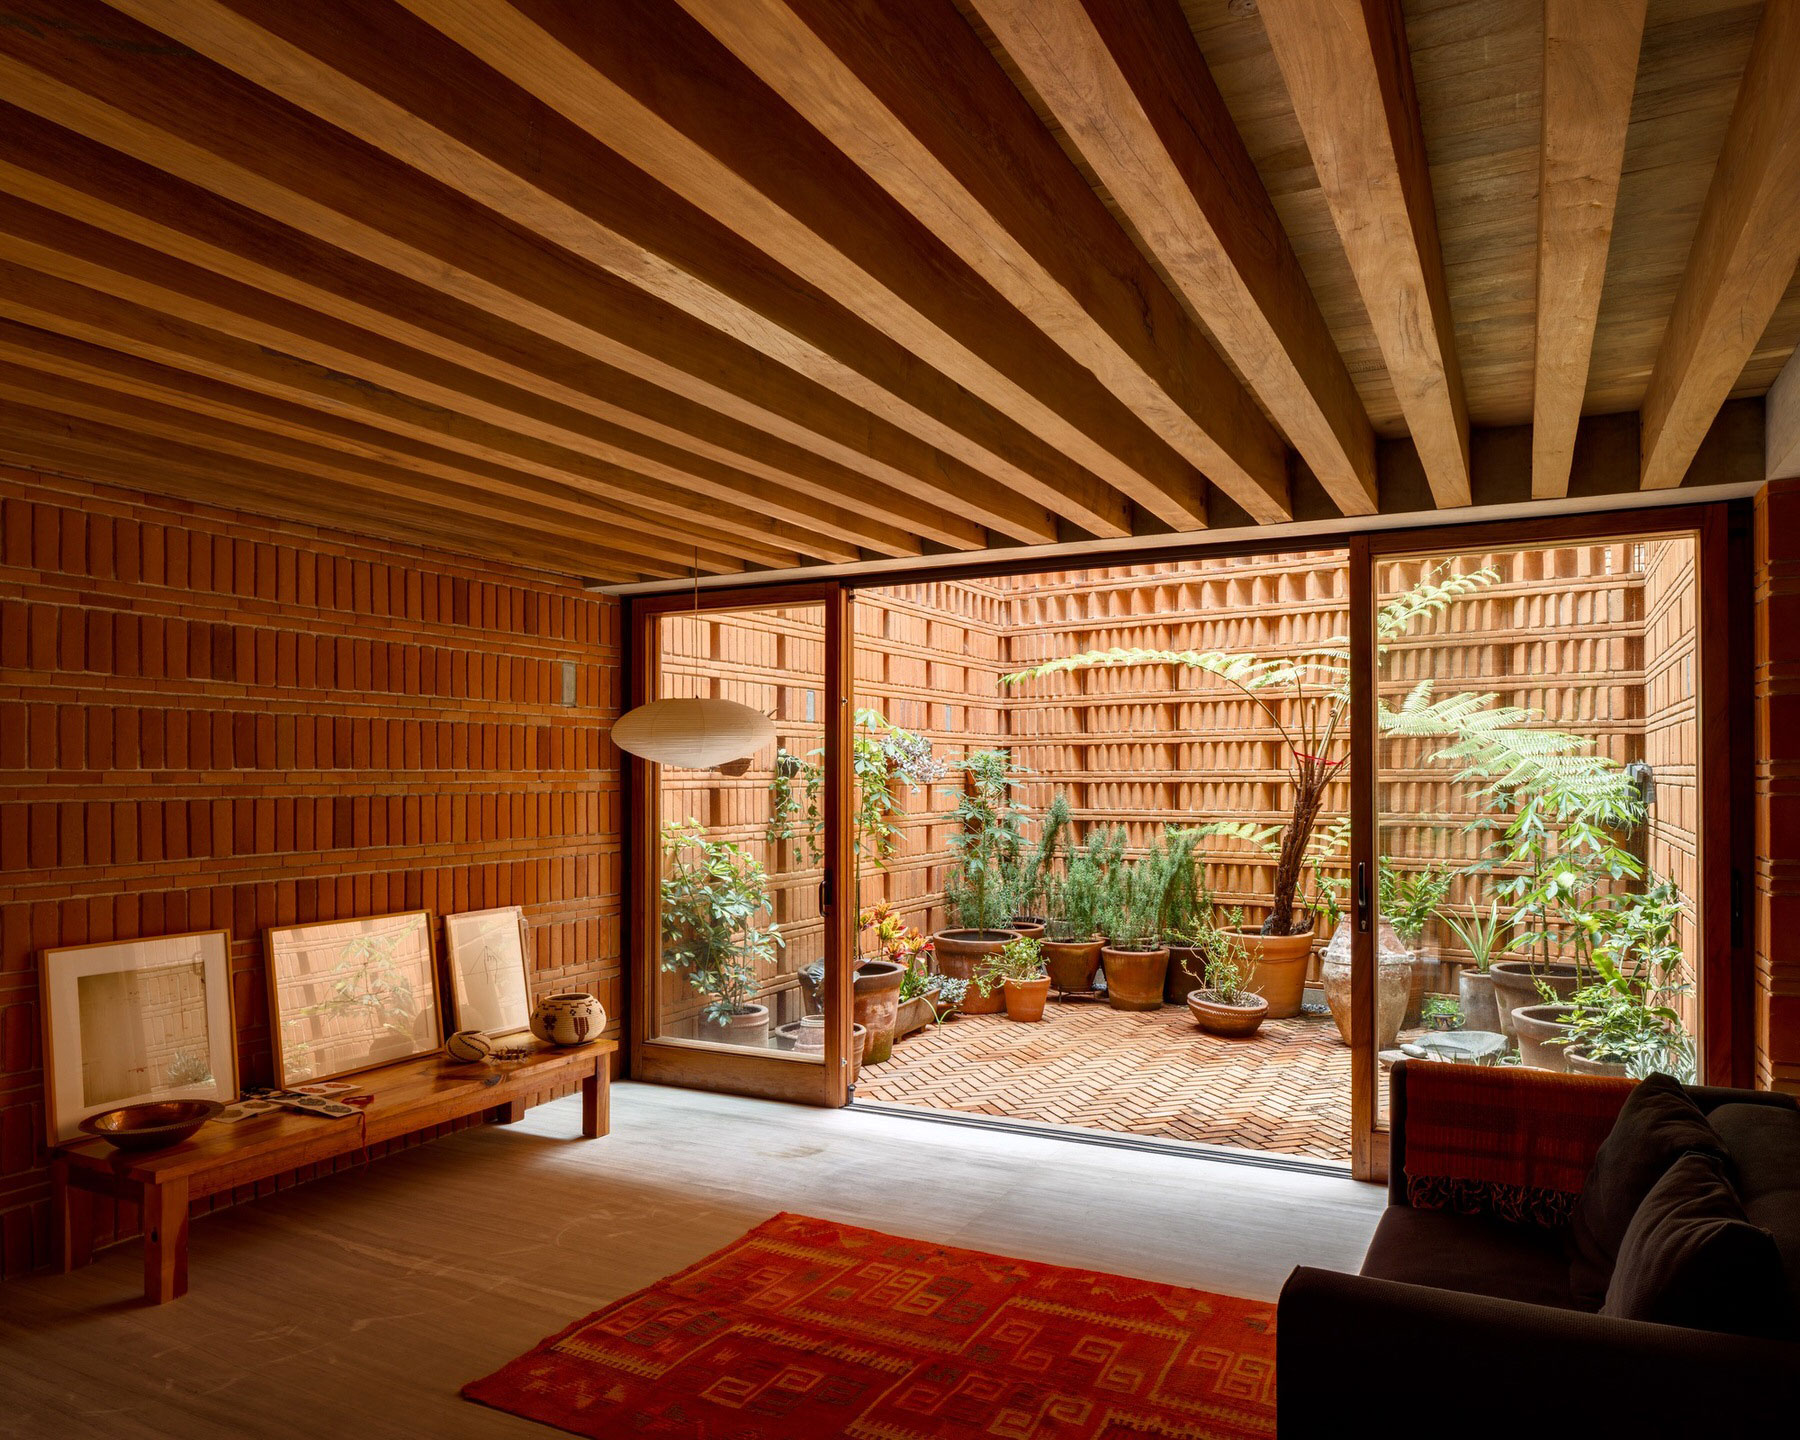 Iturbide Studio Mexico City Brick Architecture Taller Mauricio Rocha Gabriela Carrillo Yellowtrace 16